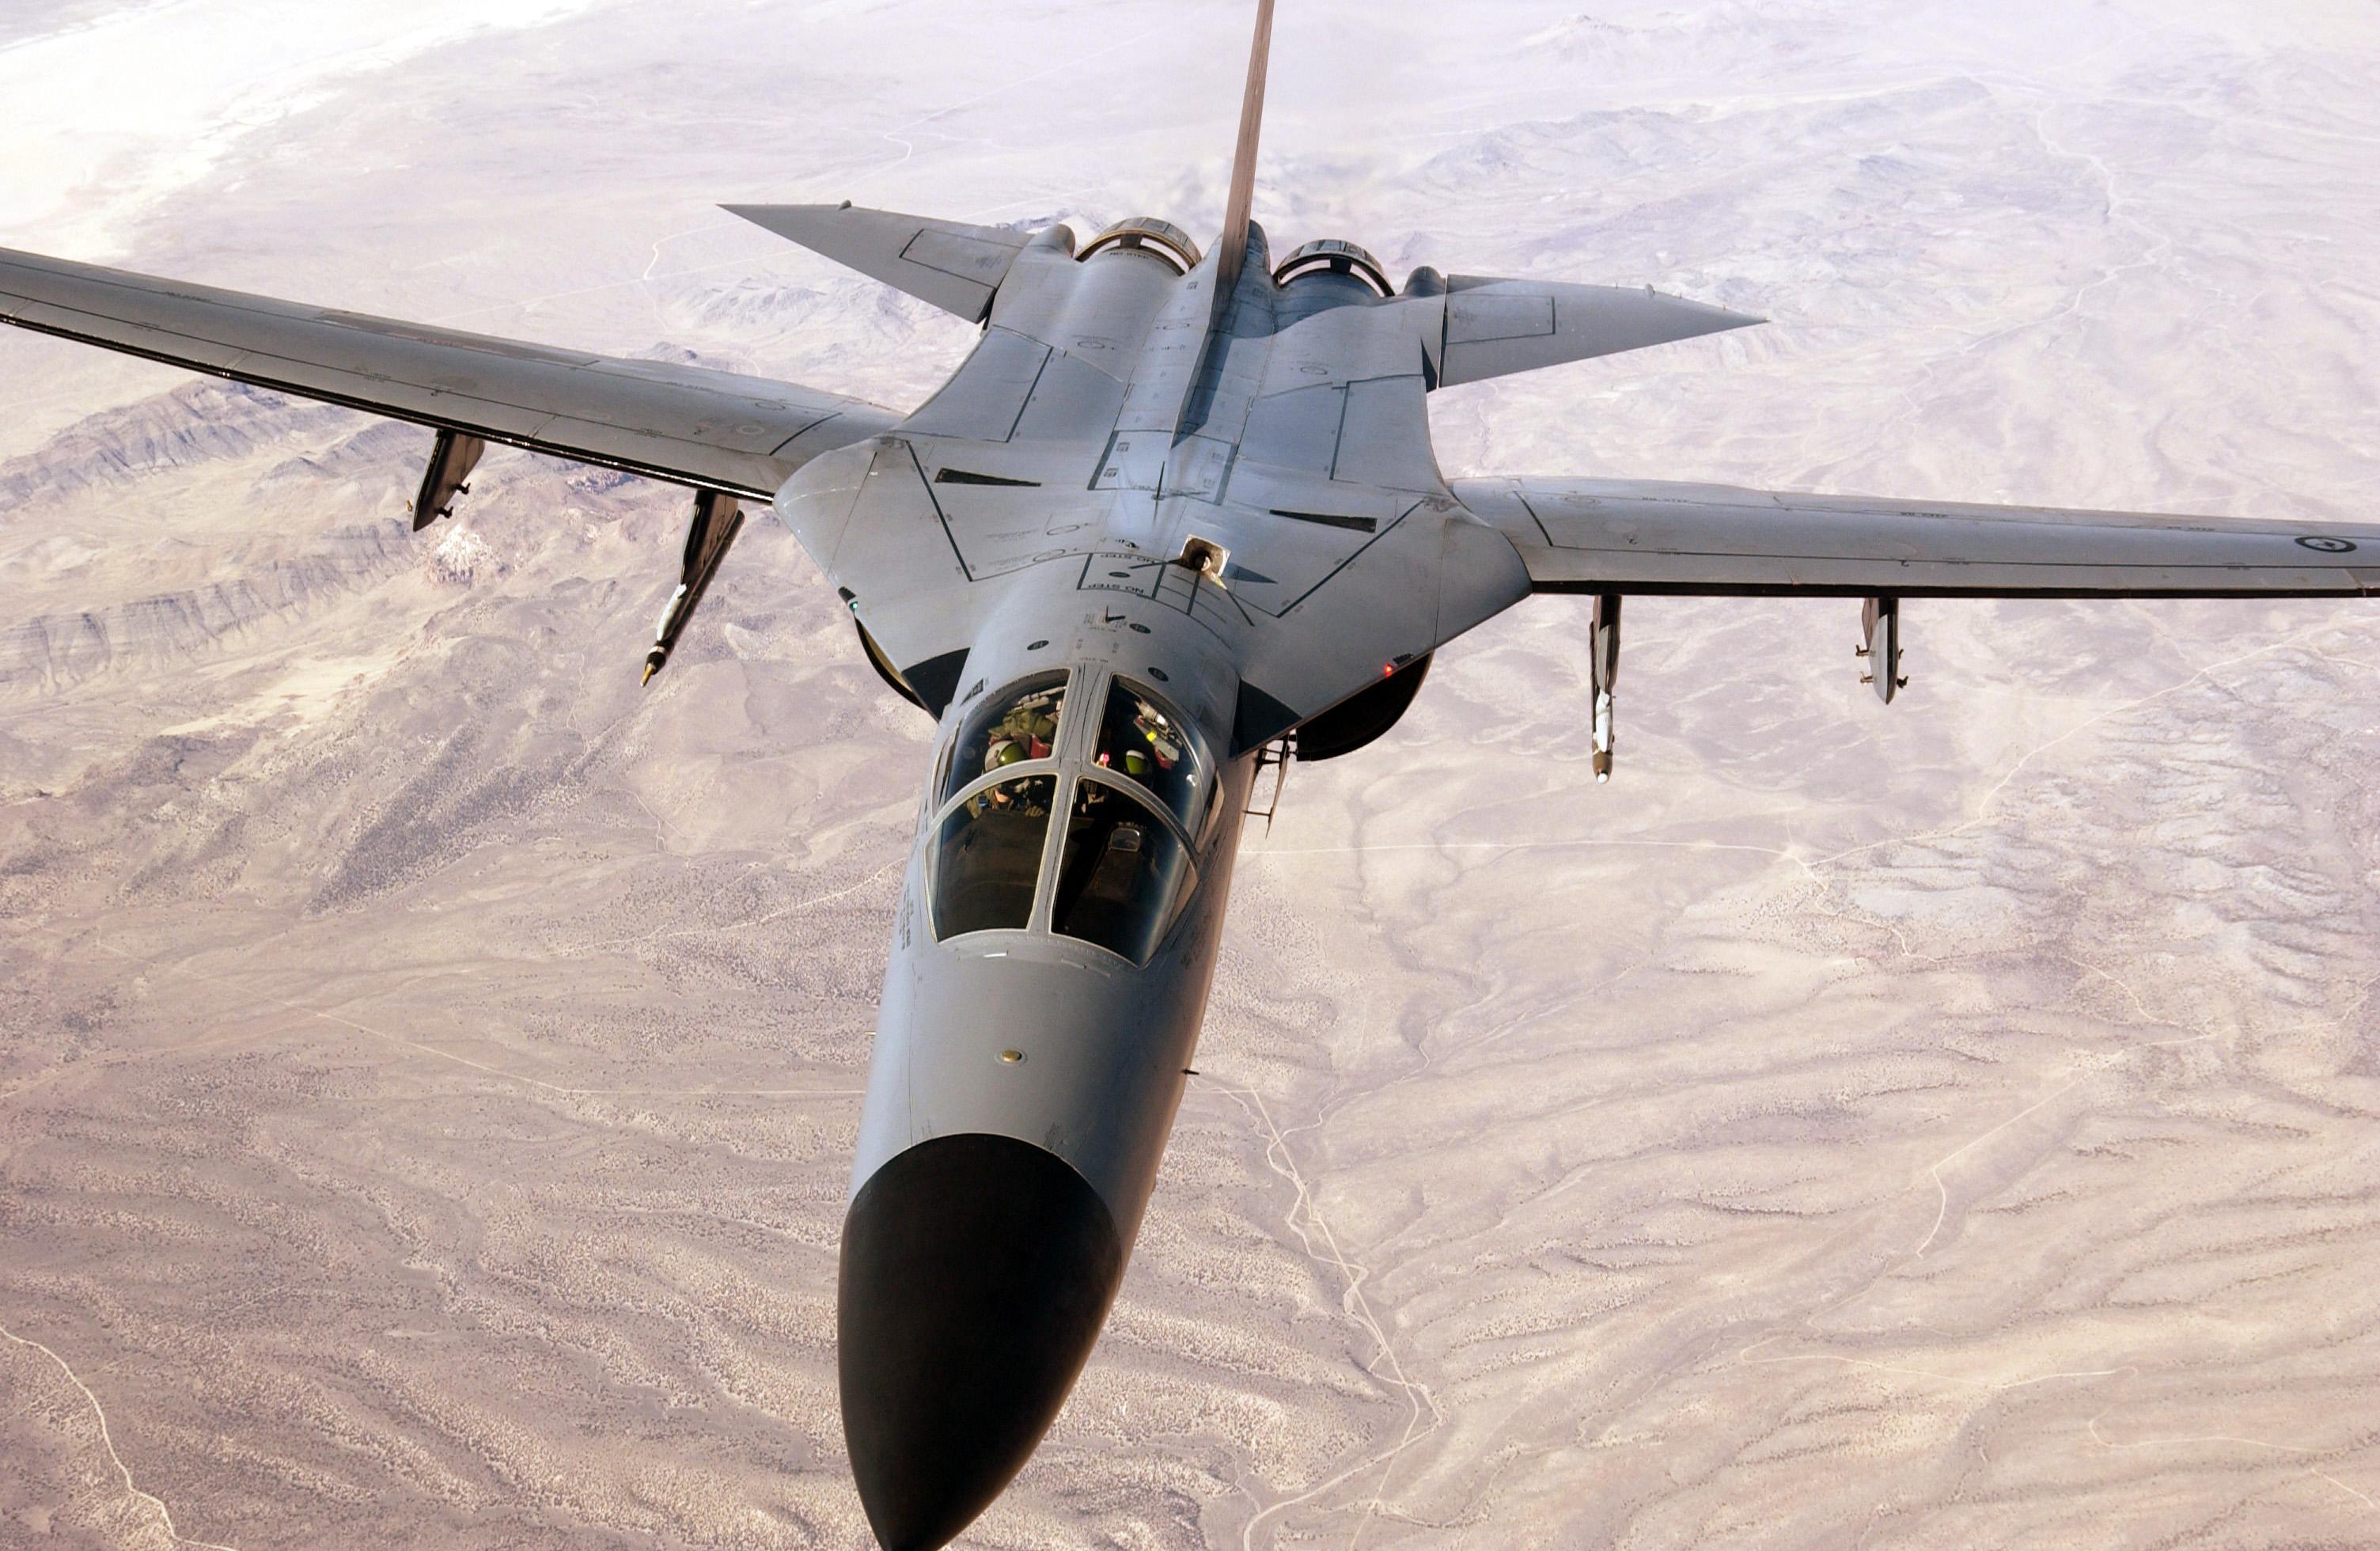 File:Australian F-111C 2006.jpeg - Wikimedia Commons